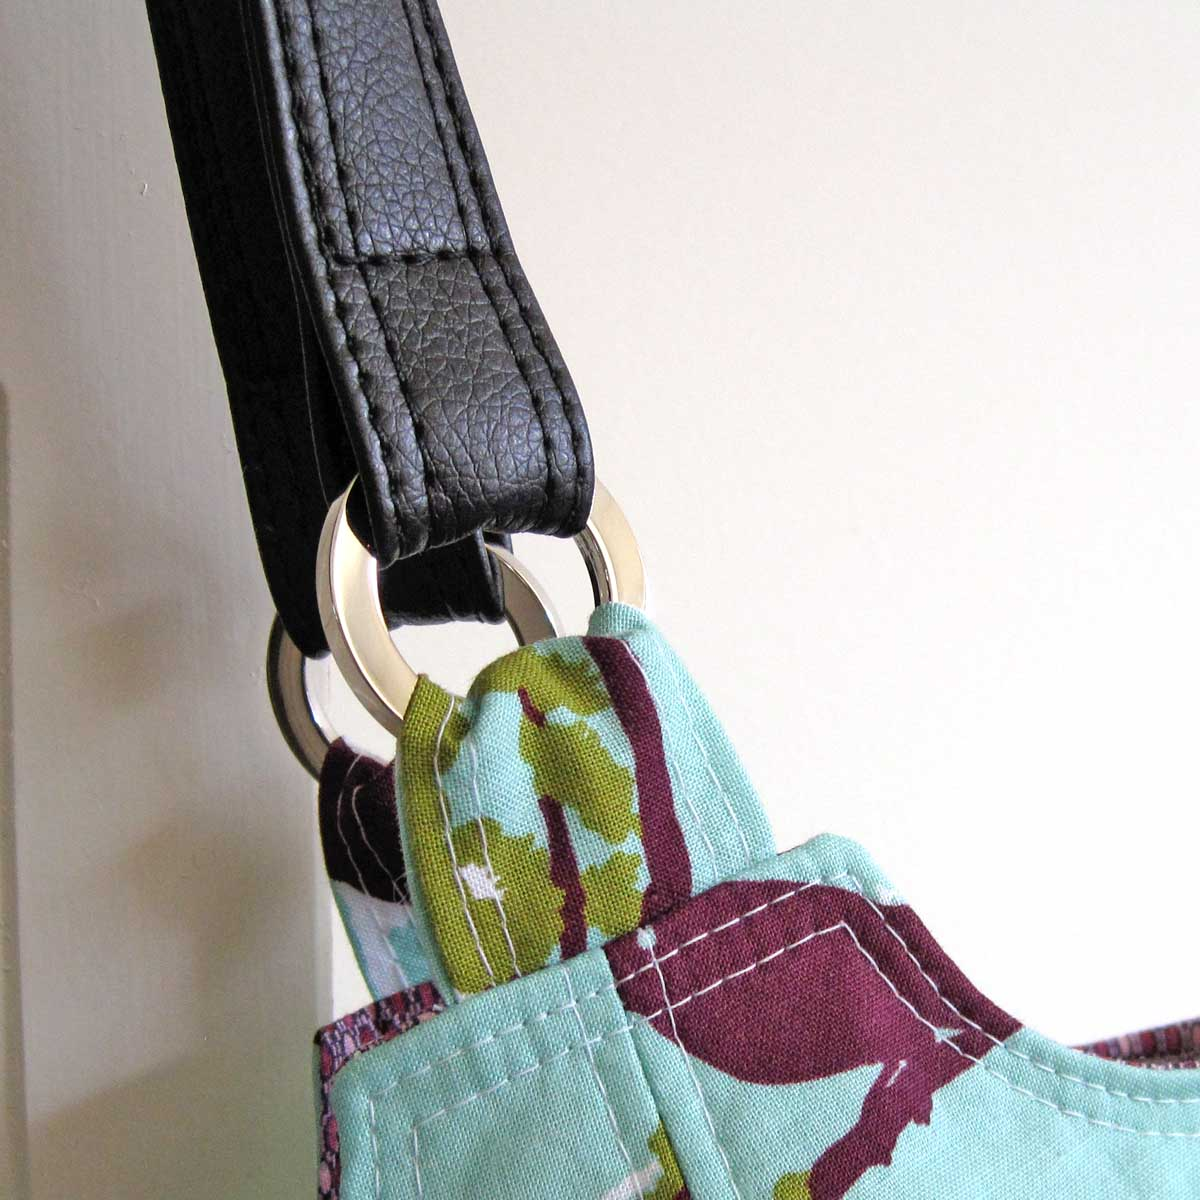 Emmaline Bags Sewing Patterns And Purse Supplies Make